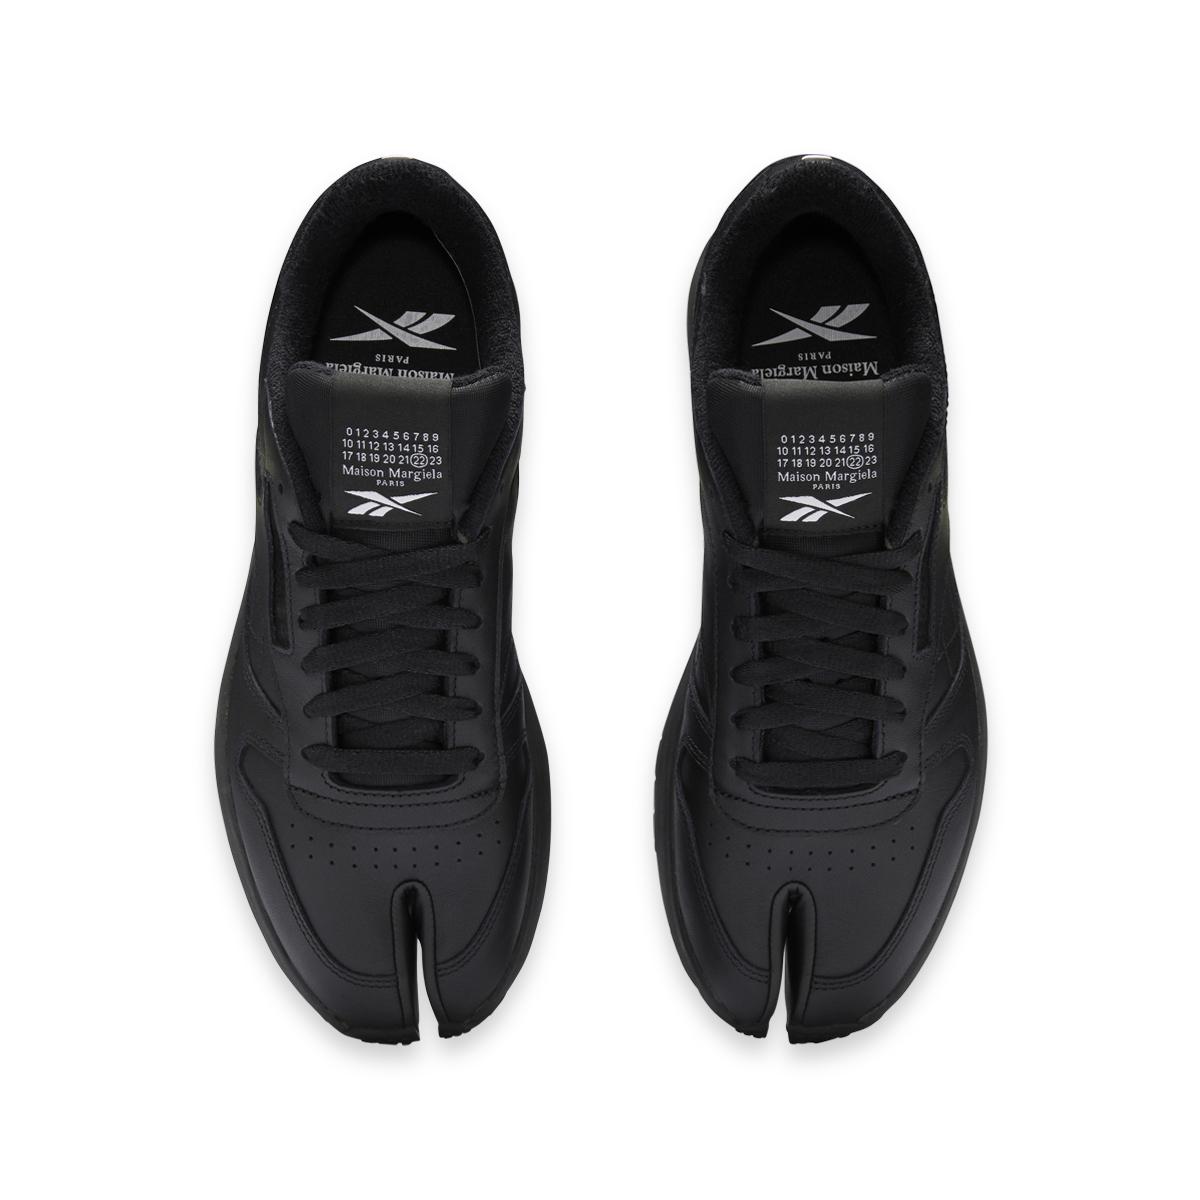 Maison Margiela X Reebok Project 0 CL Classic Leather Tabis Black Top